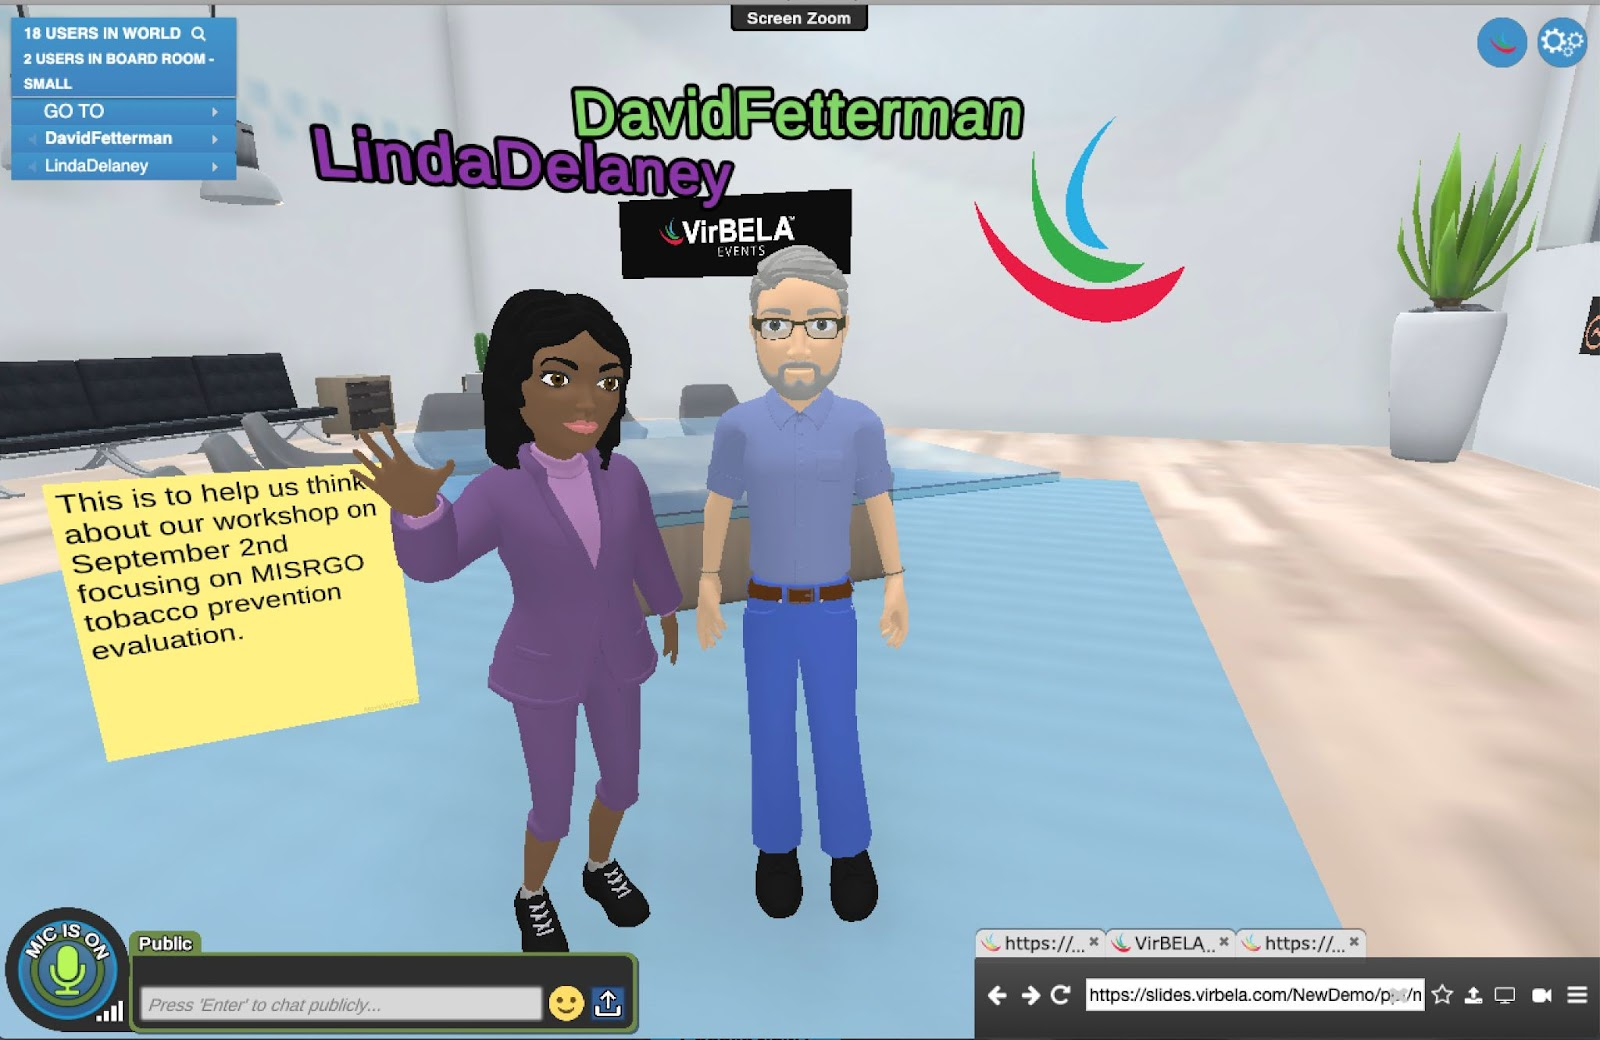 Image of VirBela screen with avatars of David and Linda.